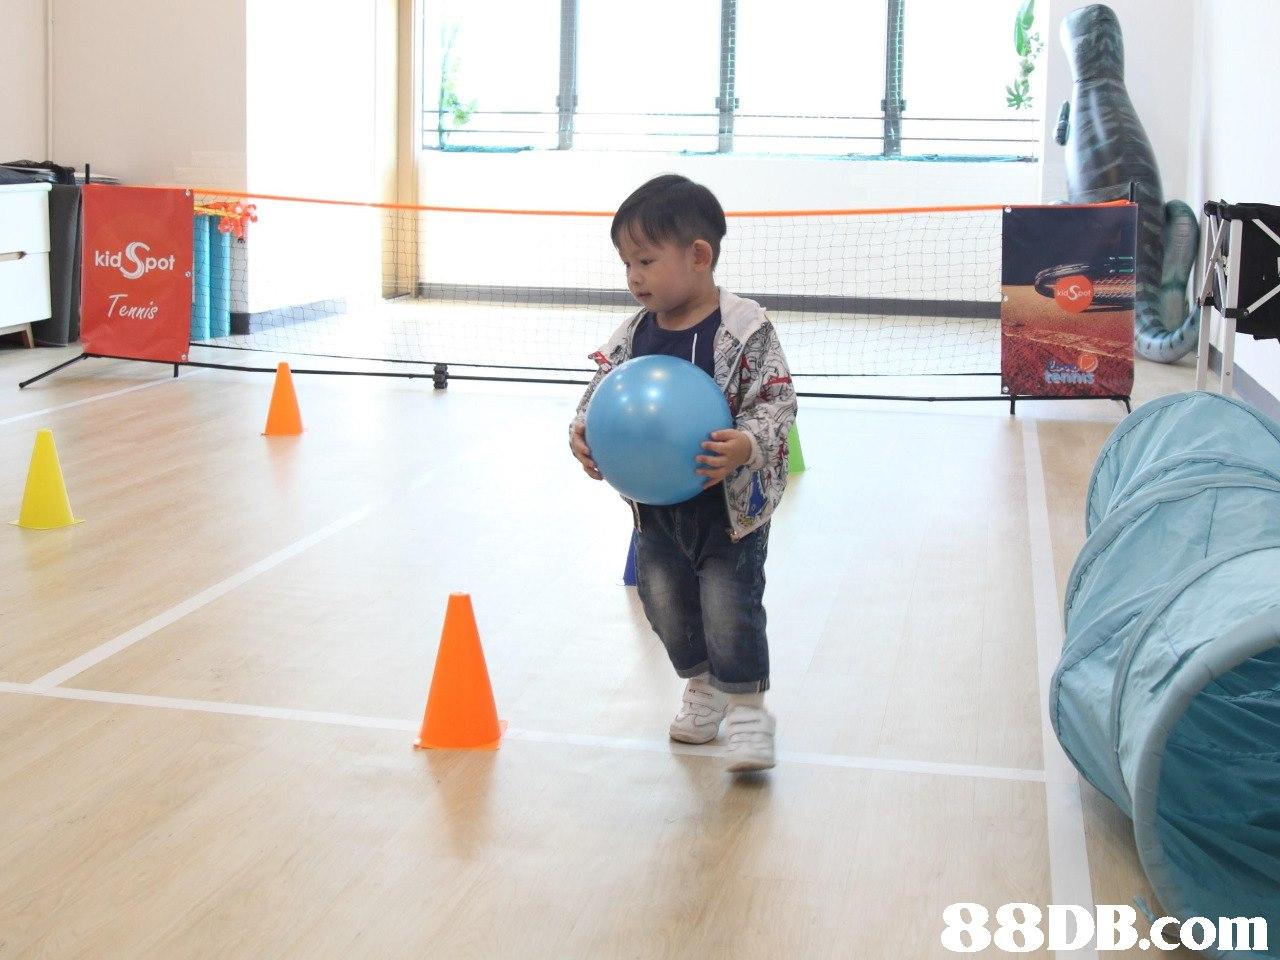 kidpot ennis   ball,sport venue,leisure,sports,floor